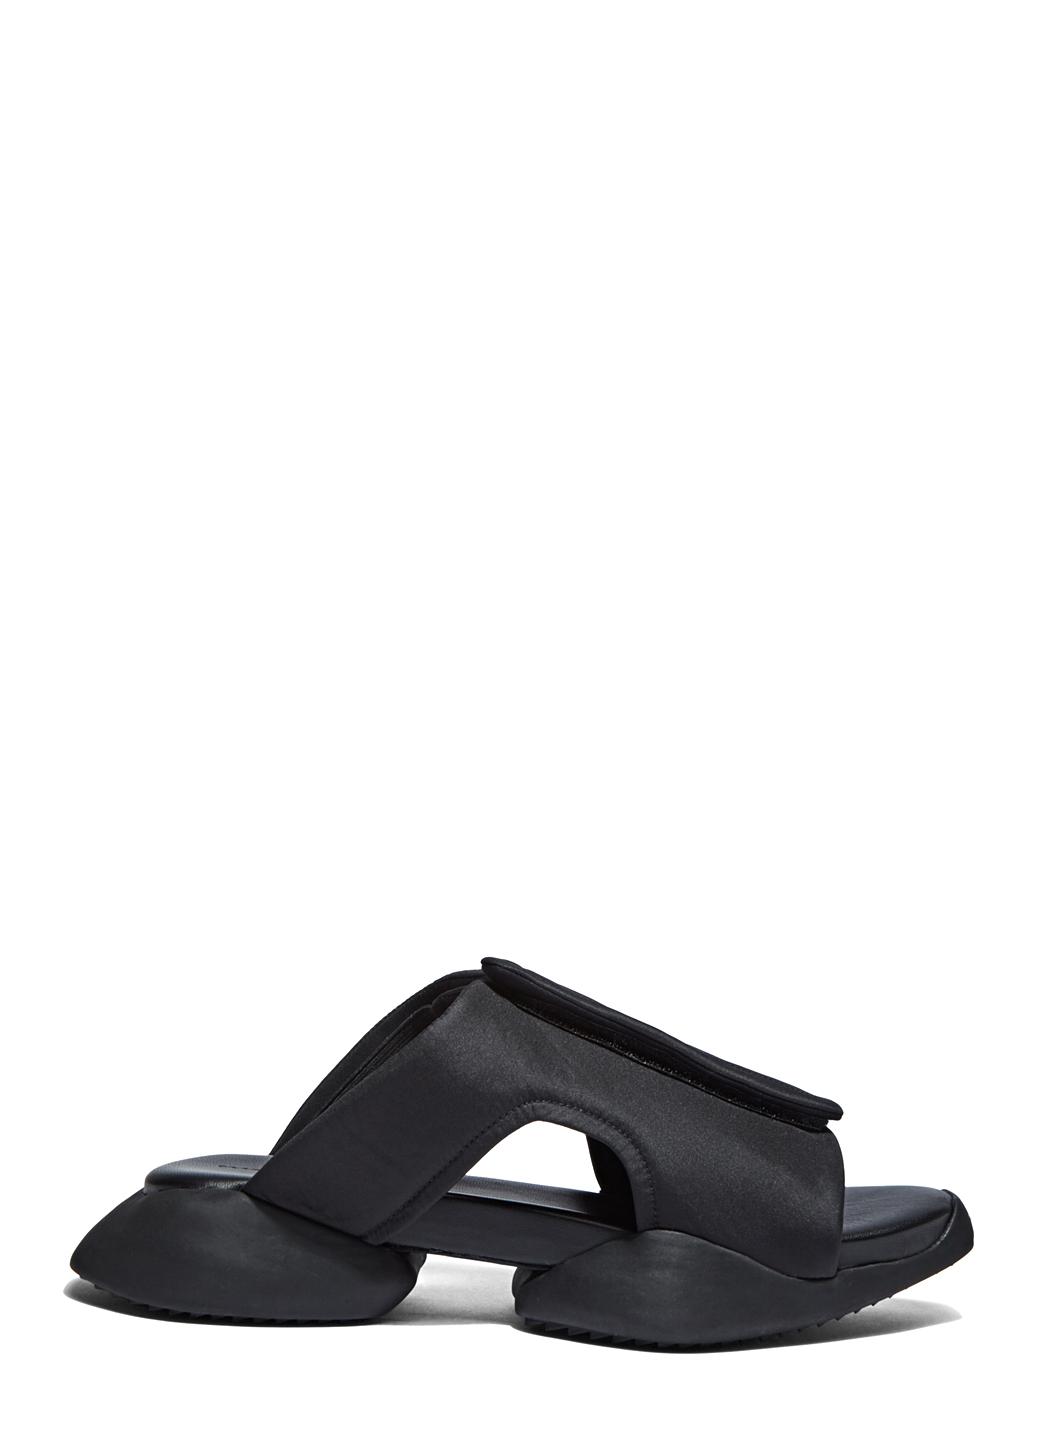 041605e94942 Lyst - Rick Owens X Adidas Men s Velcro Strap Ro Clog Sandals In ...